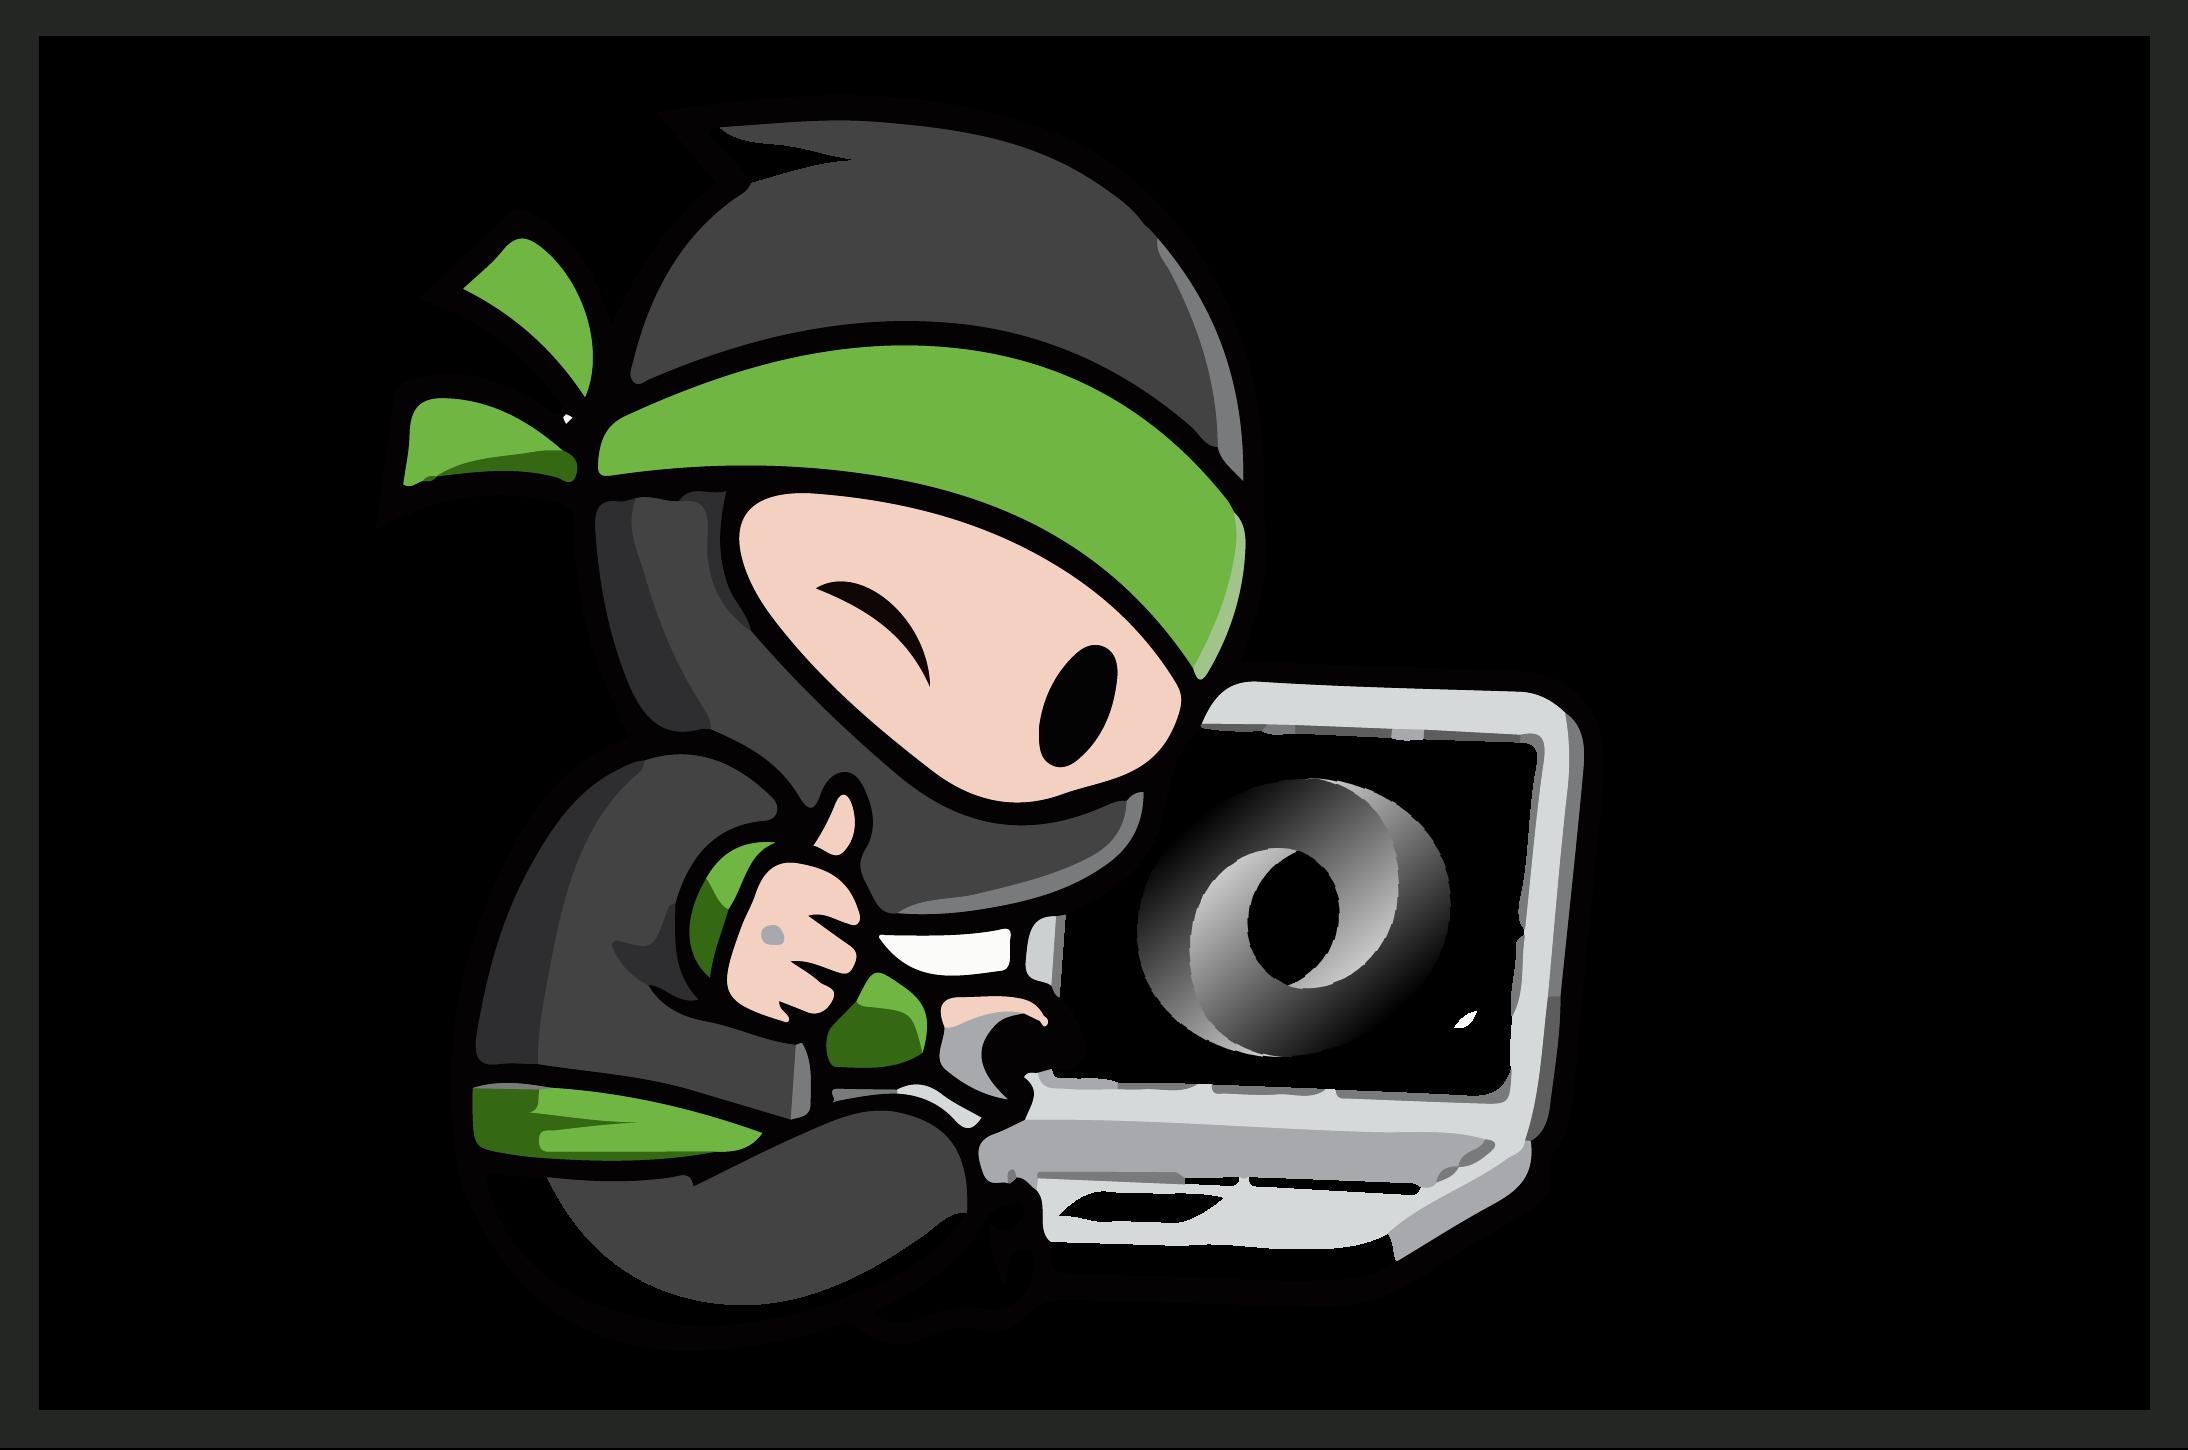 CVE-2019-18935: Remote Code Execution via Insecure Deserialization in Telerik UI